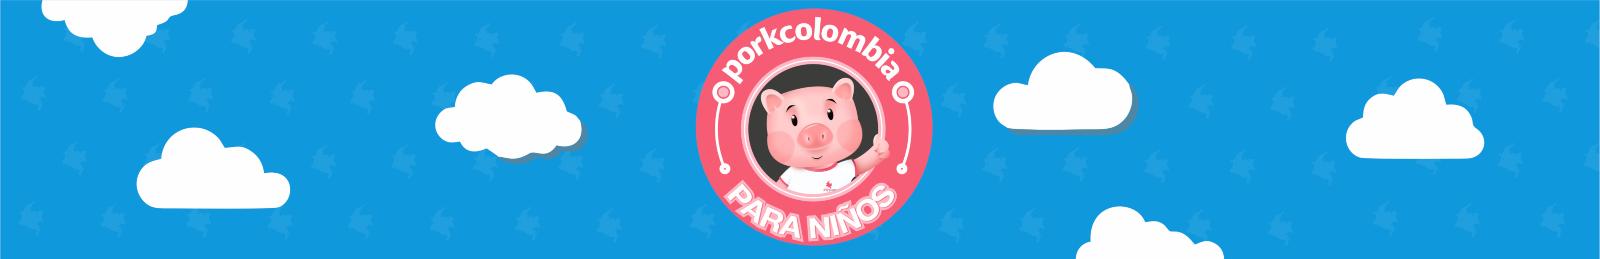 https://www.porkcolombia.co/wp-content/uploads/2020/08/Banner-niños-Porkcolombia.png